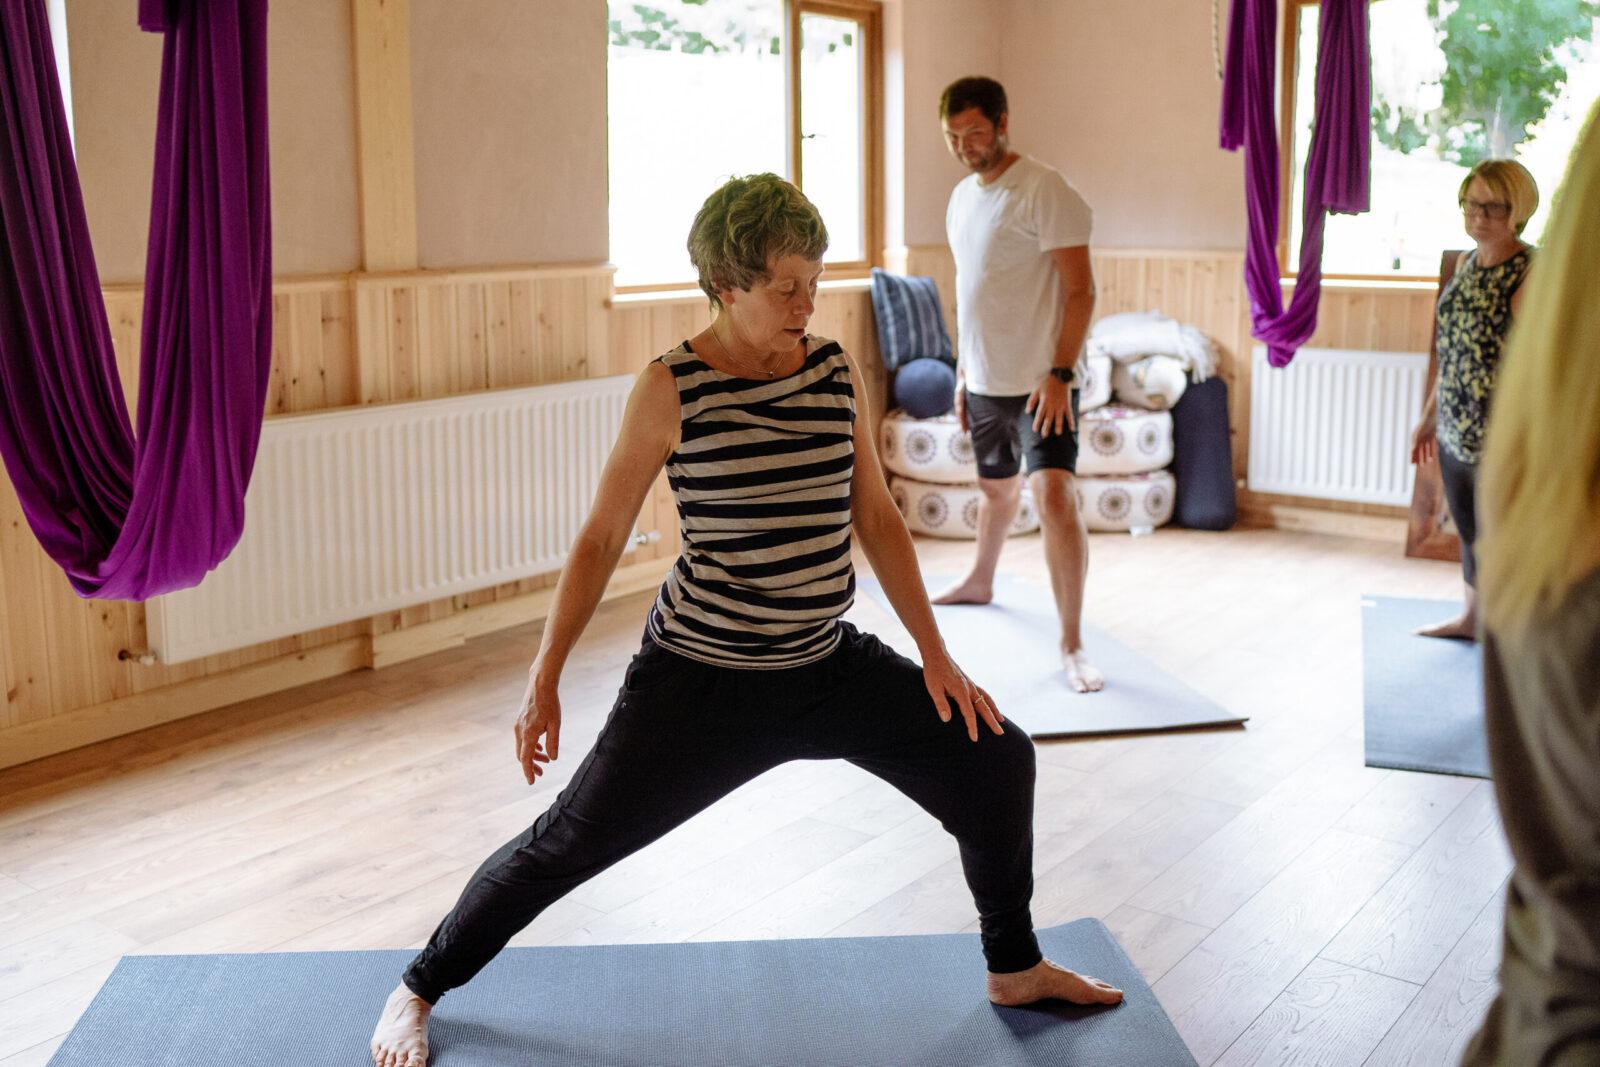 Lorraine leading a yoga class in the Yogandspice Studio.